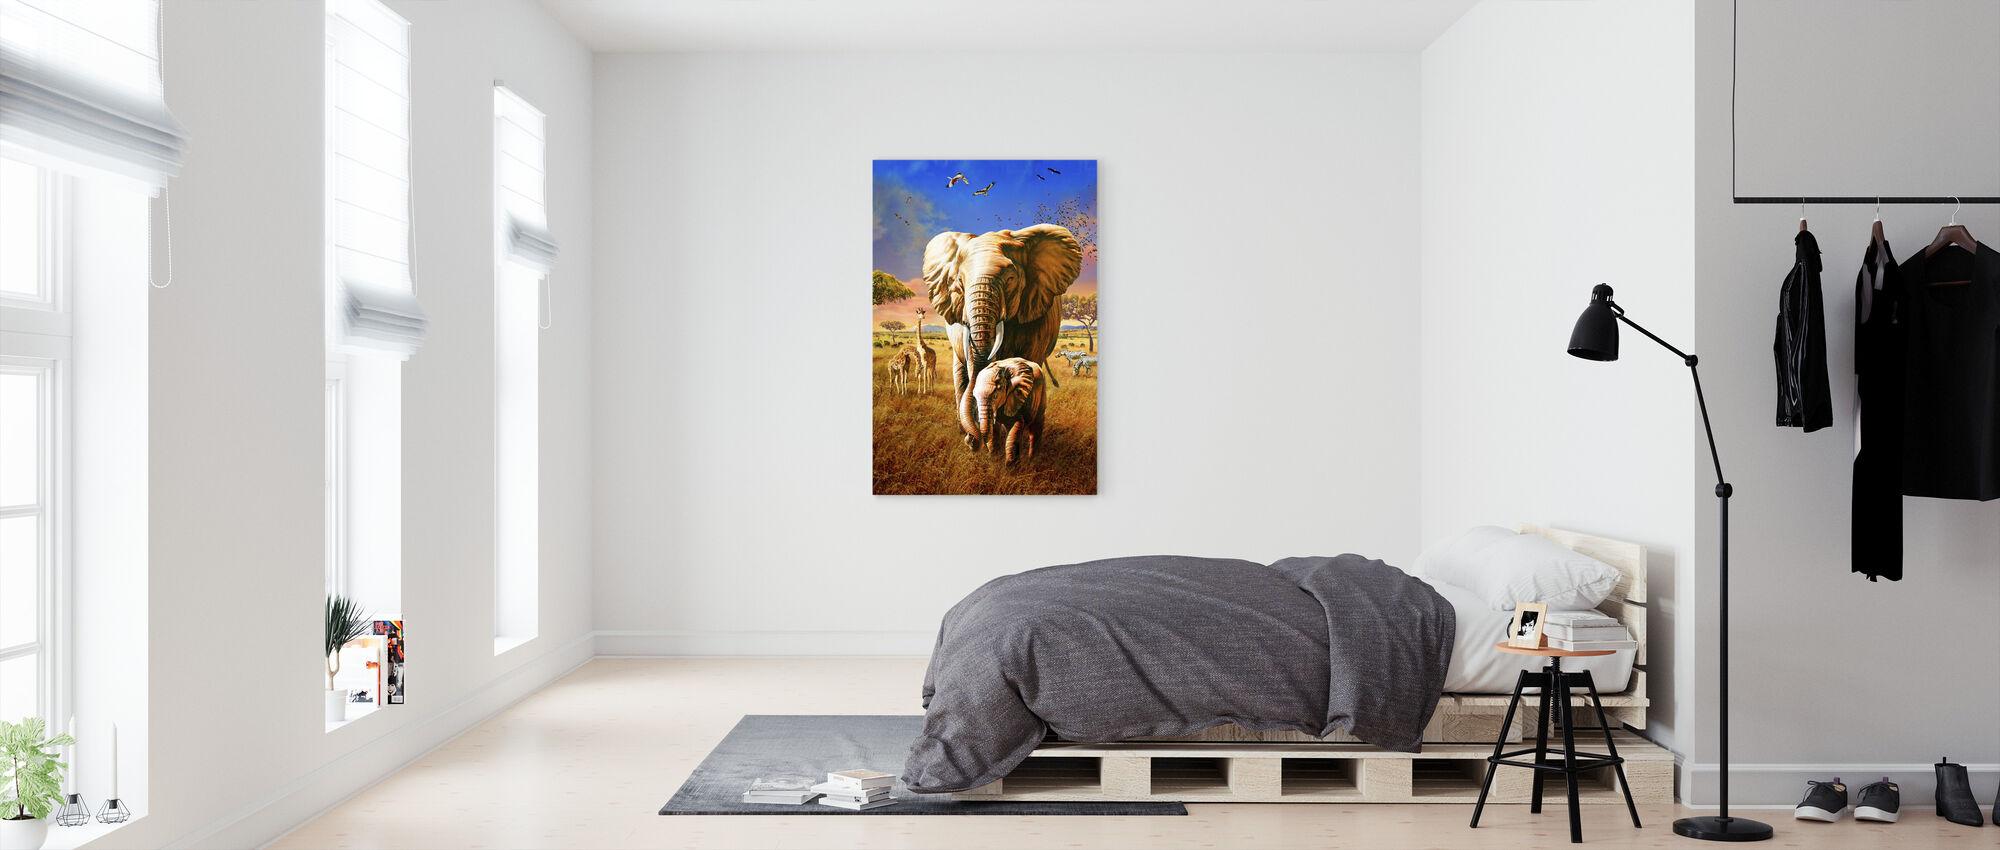 Elephant - Canvas print - Bedroom